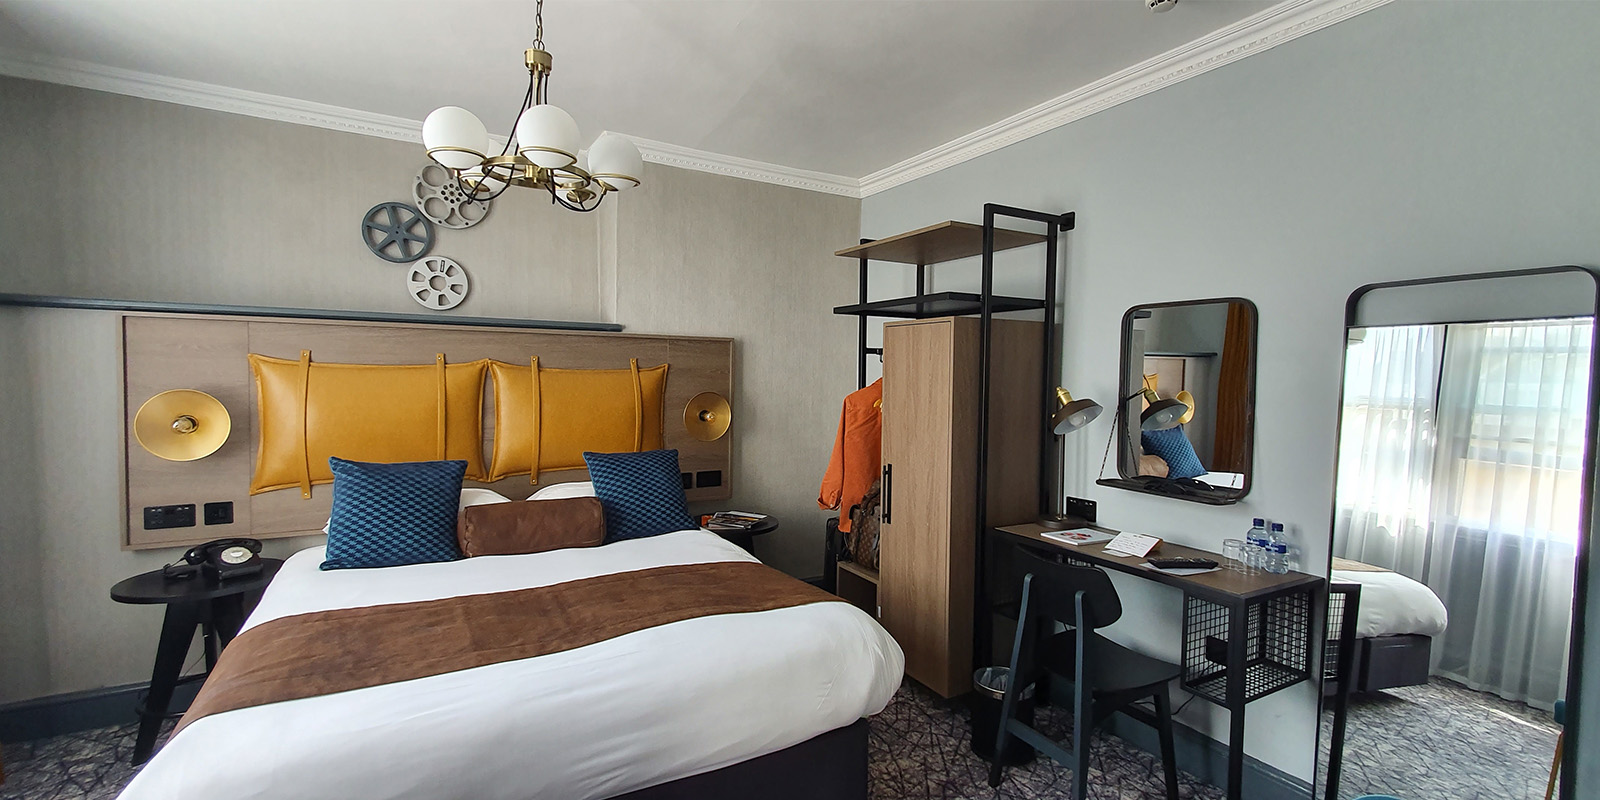 Luxurious Boutique Hotel in City Centre Bath